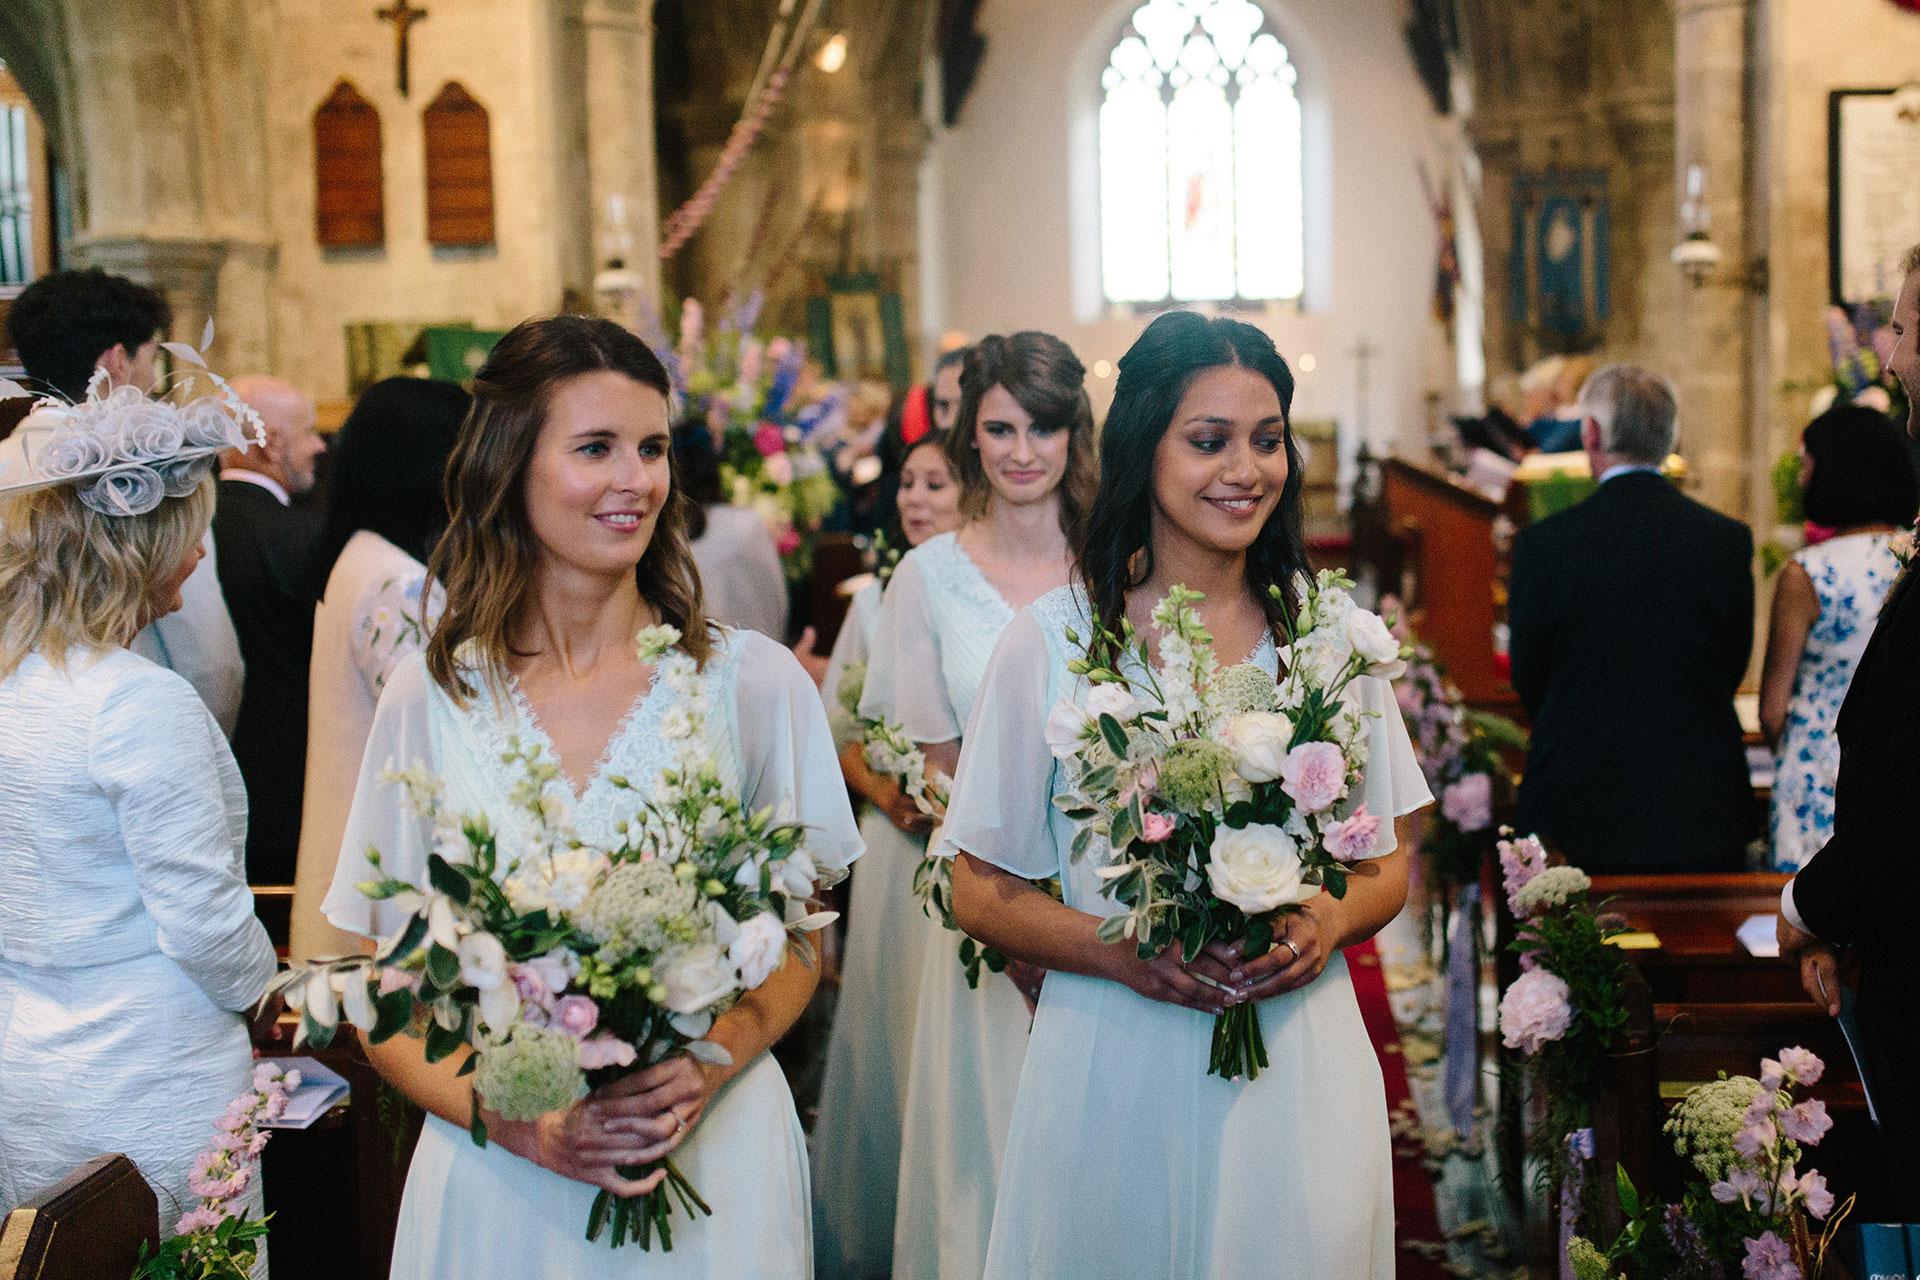 Langar-Hall-wedding-photographer-in-Nottinghamshire-Michael-Newington-Gray-44.jpg